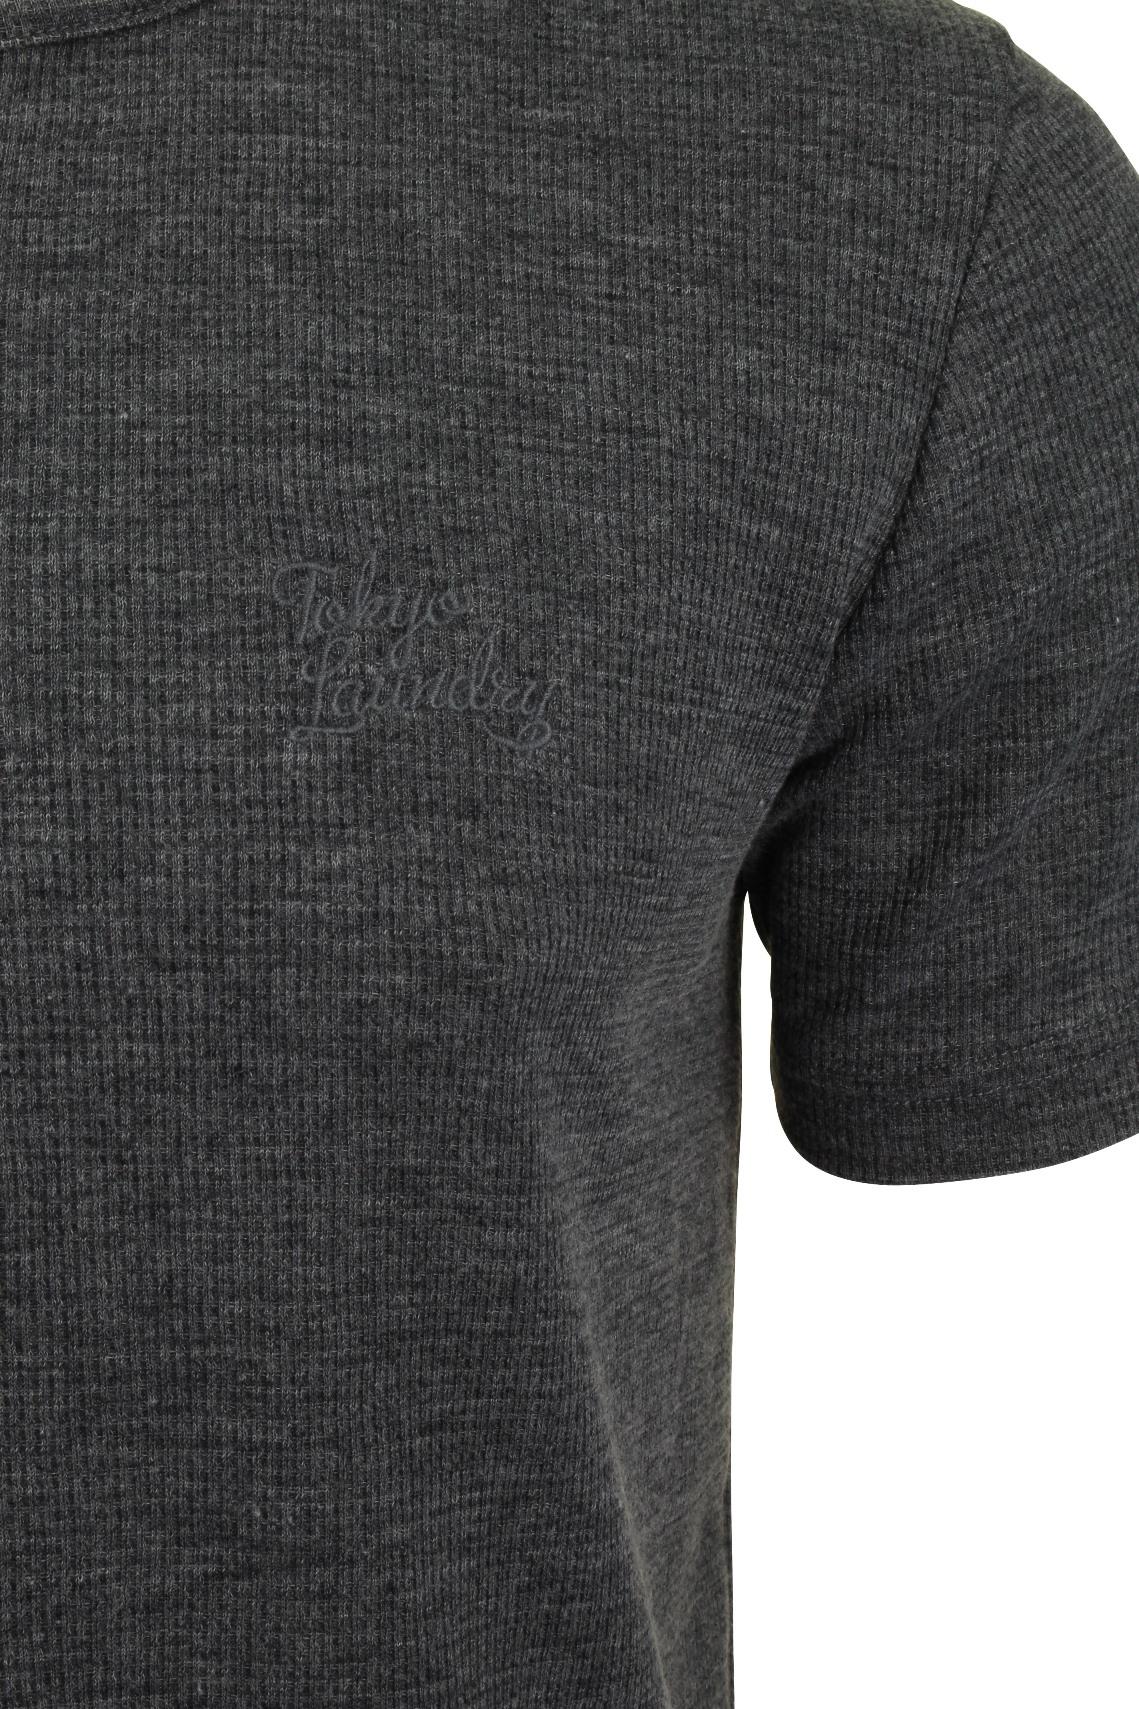 Mens-Tokyo-Laundry-Grandad-T-Shirt-Waffle-Burn-Out-Fabric thumbnail 4